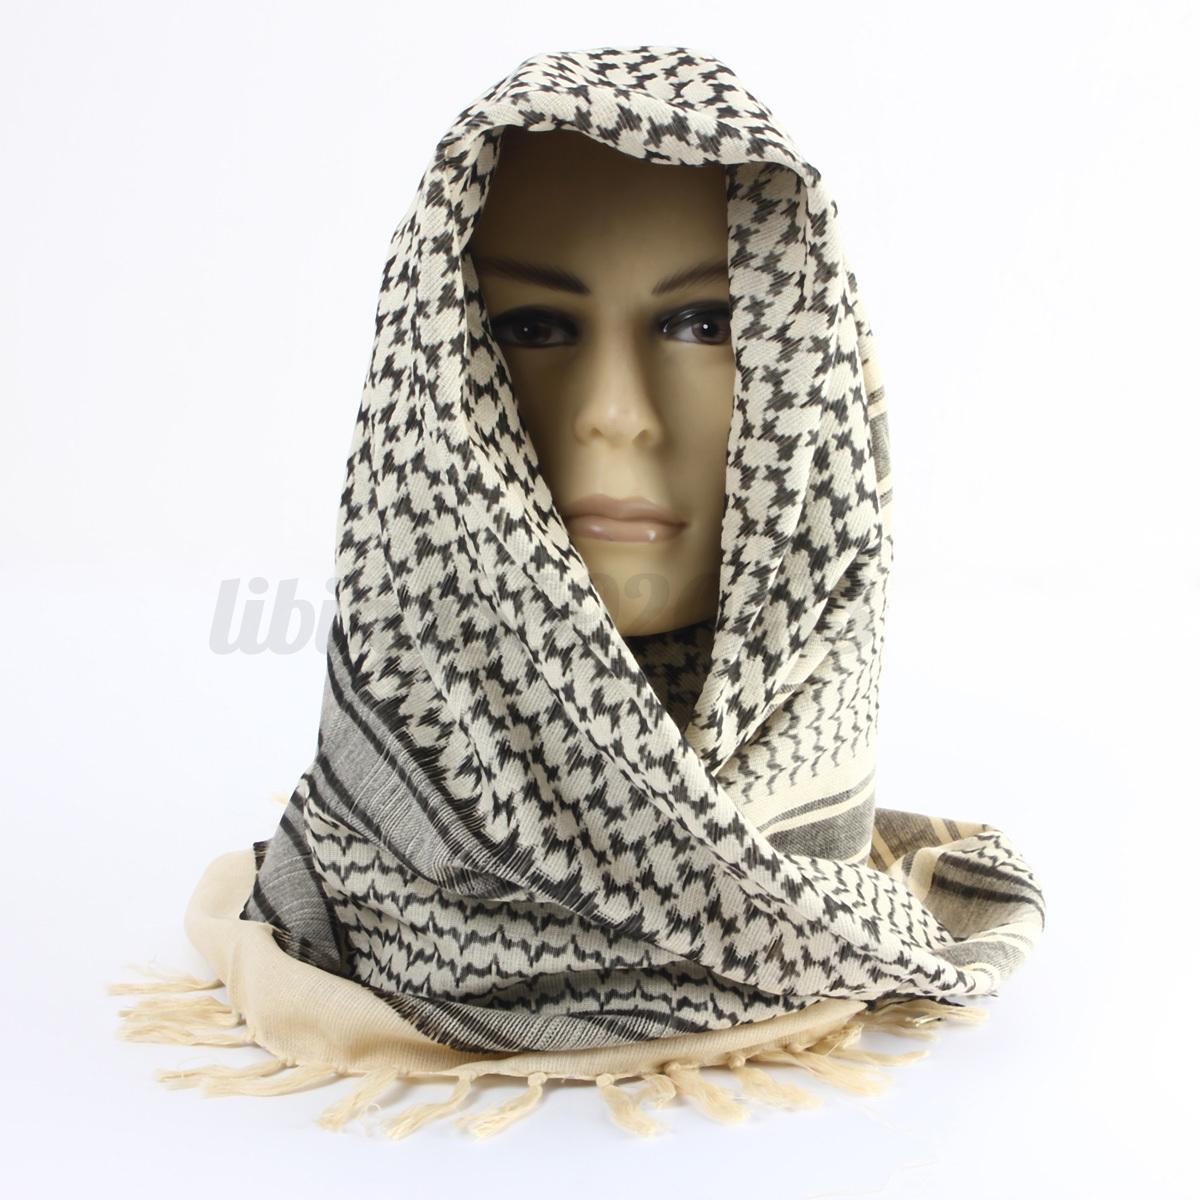 Shemagh-Militare-sciarpa-Tattico-Keffiyeh-Uomo-Donna-Scarf-Foulard-Kefiah-Araba miniatura 3